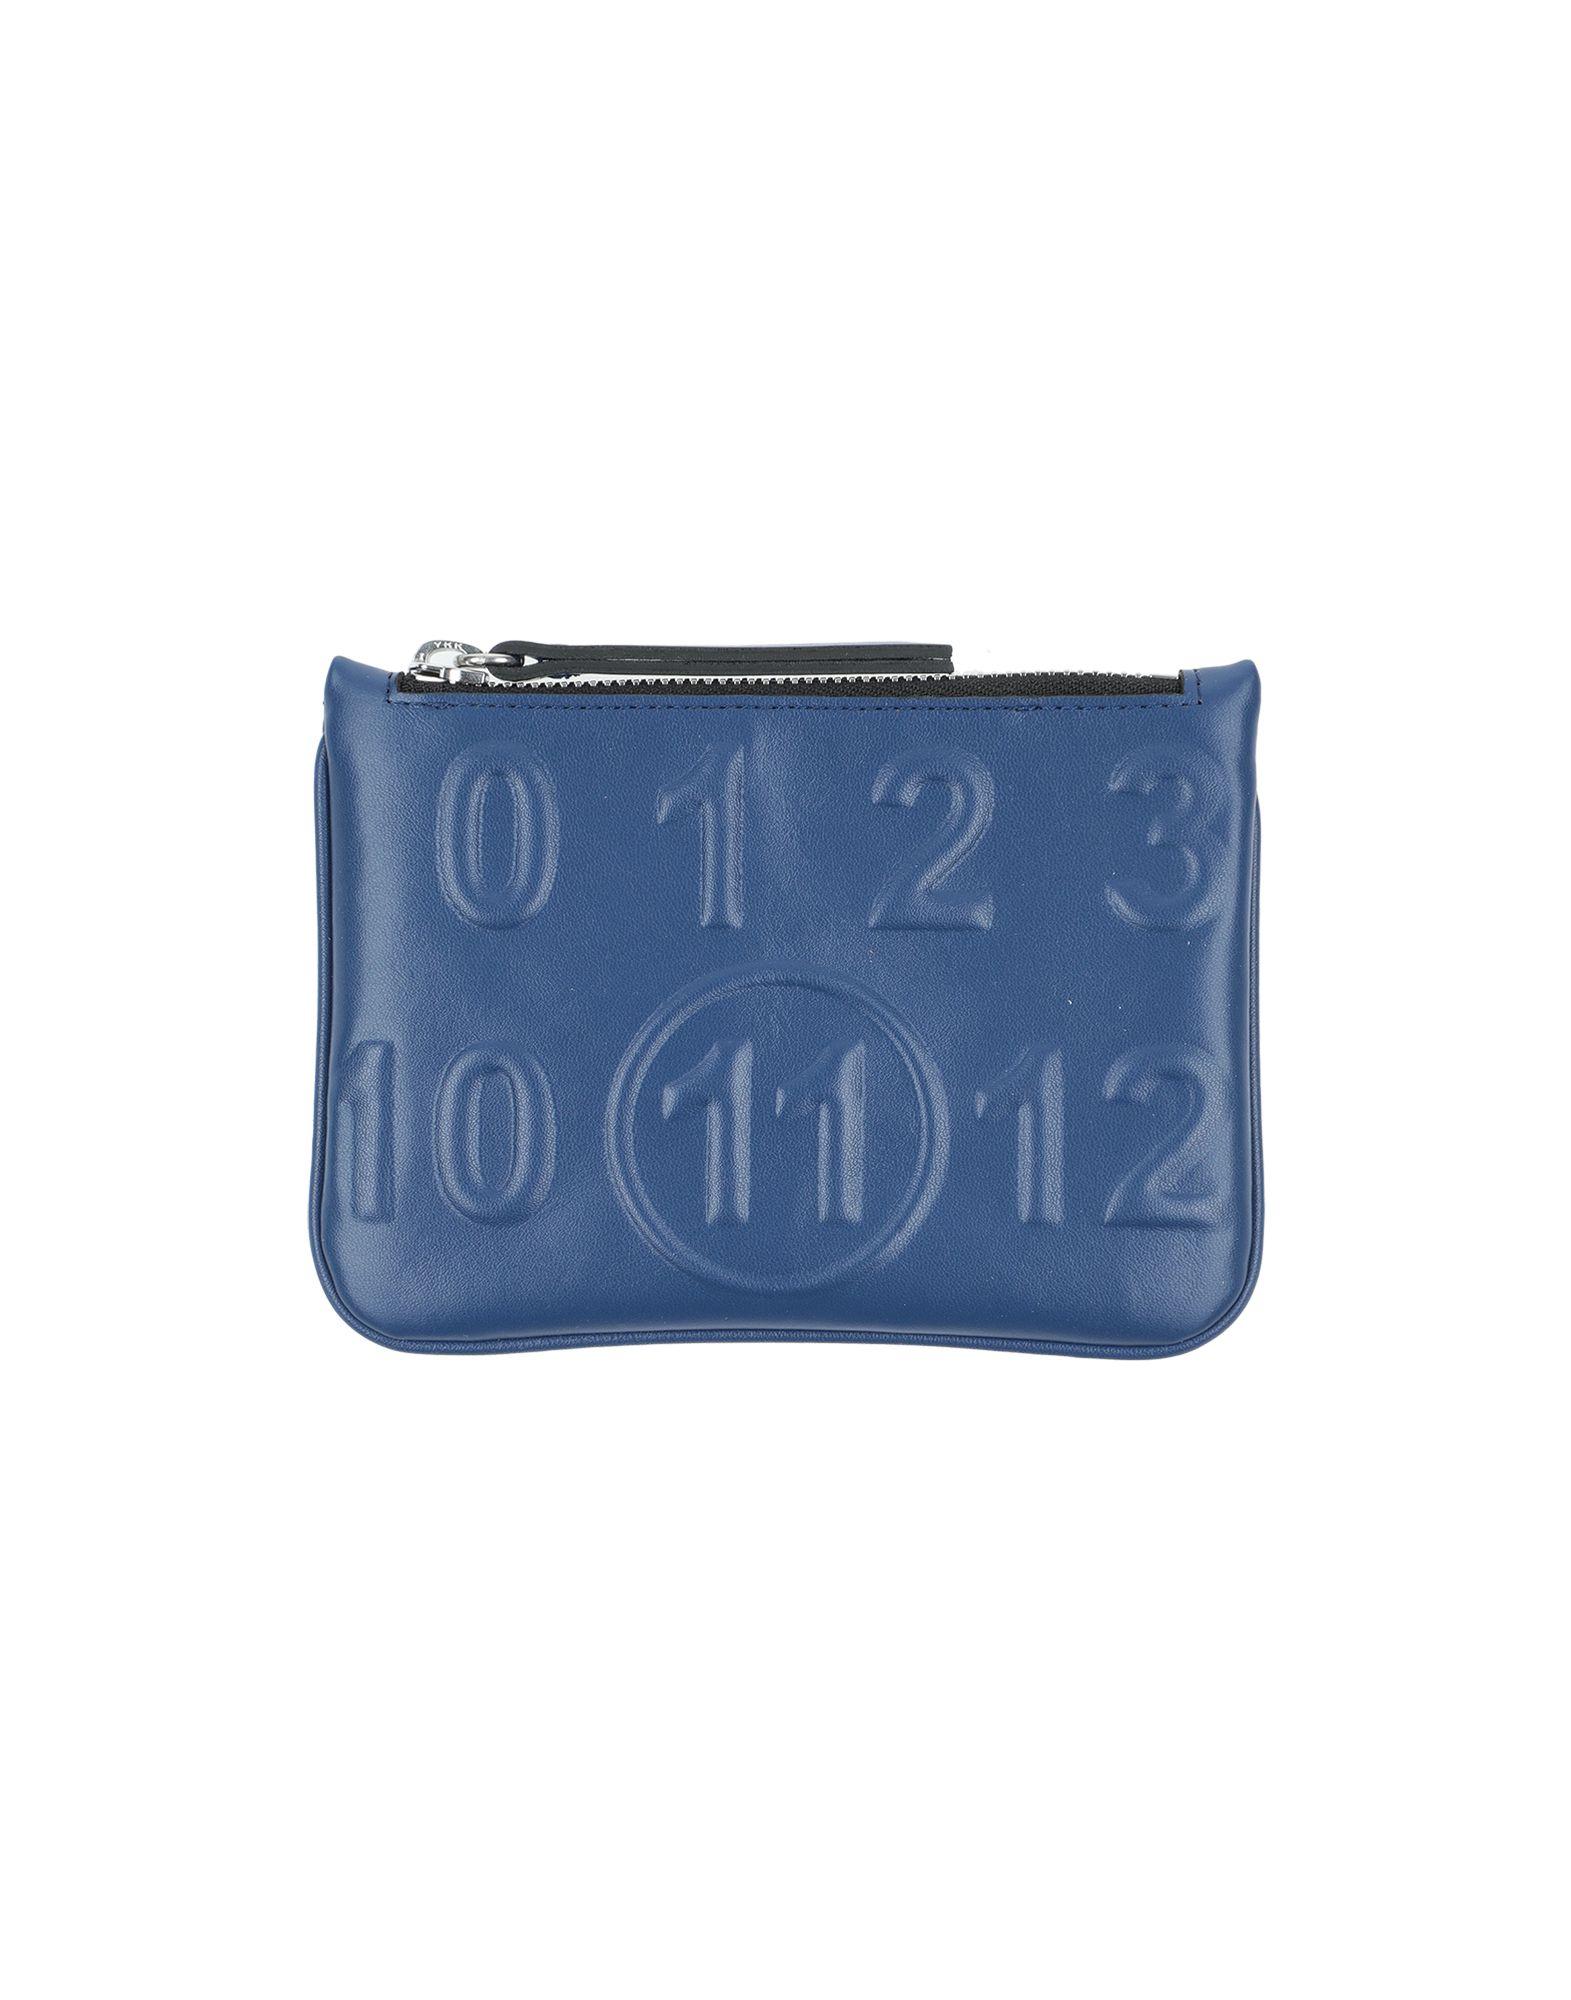 MAISON MARGIELA Pouches. faux leather, logo, solid color, zip. 57% Polyester, 43% Polyurethane